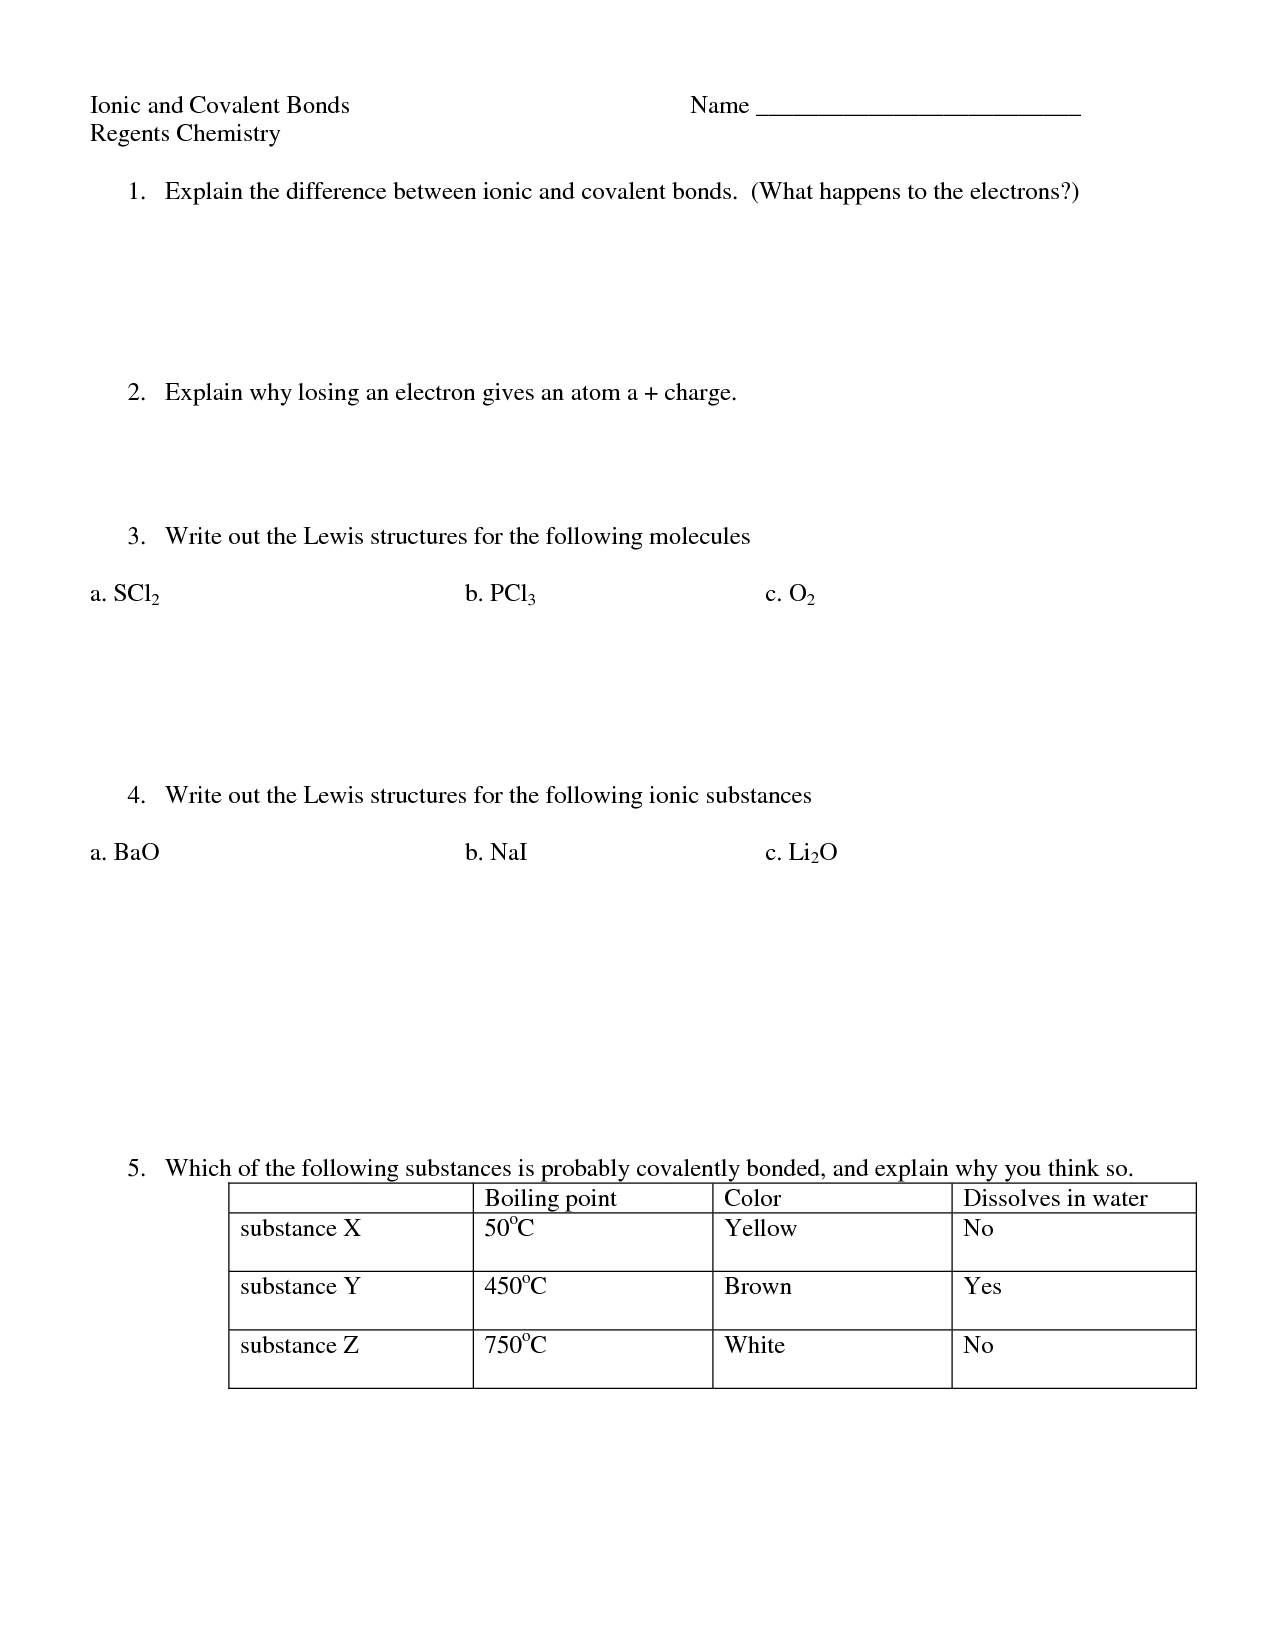 Interpreting Graphics Worksheet Answer Key